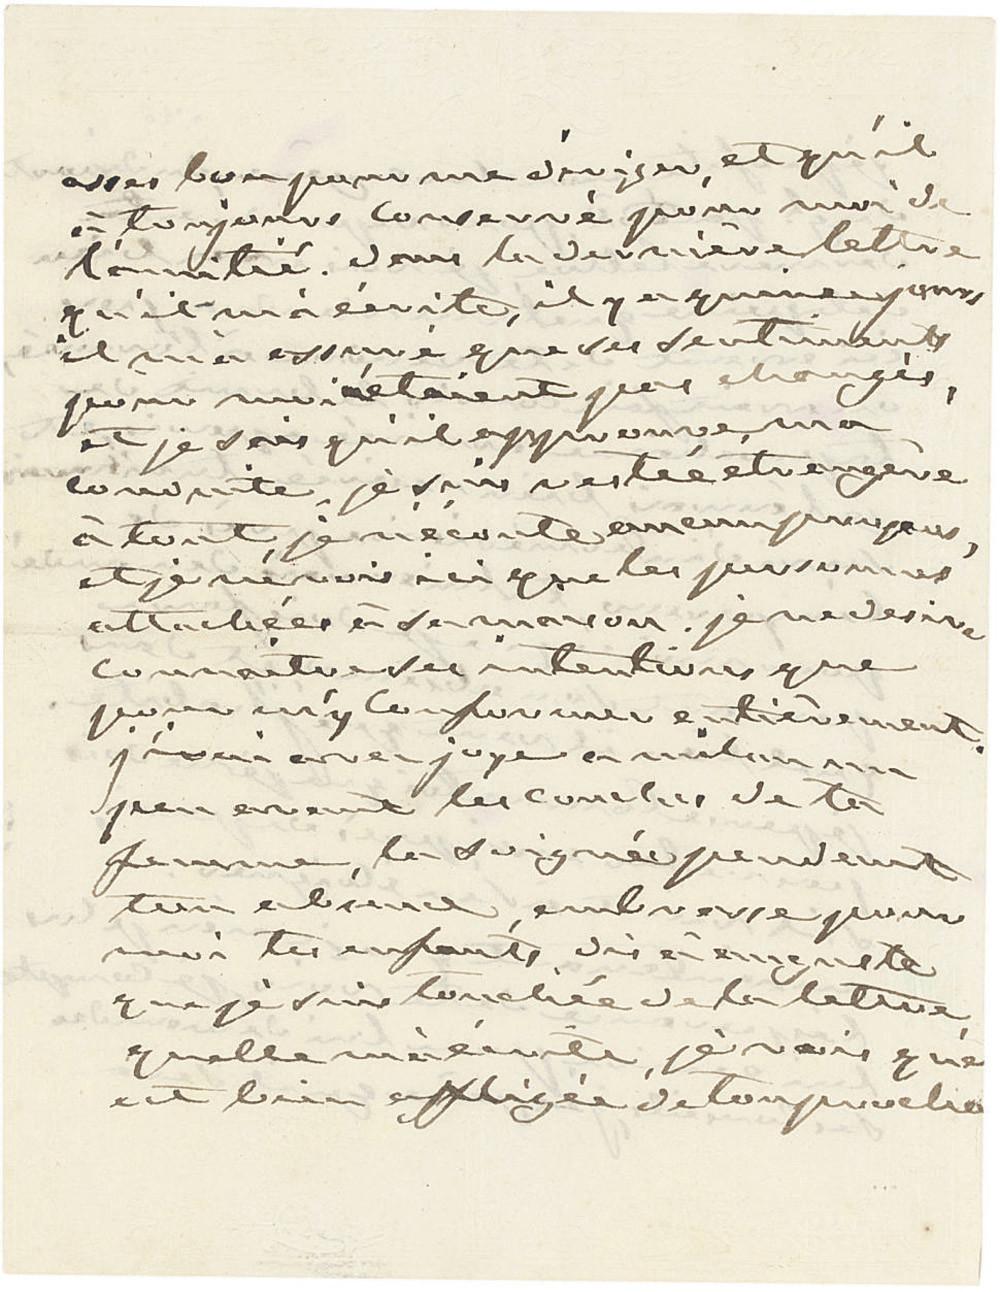 JOSEPHINE (1763-1814), Empress of Napoleon I. Autograph letter signed ('Josephine') to Eugène de Beauharnais (her son), Malmaison, 22 March [1812], 3 pages, 8vo, on a bifolium.